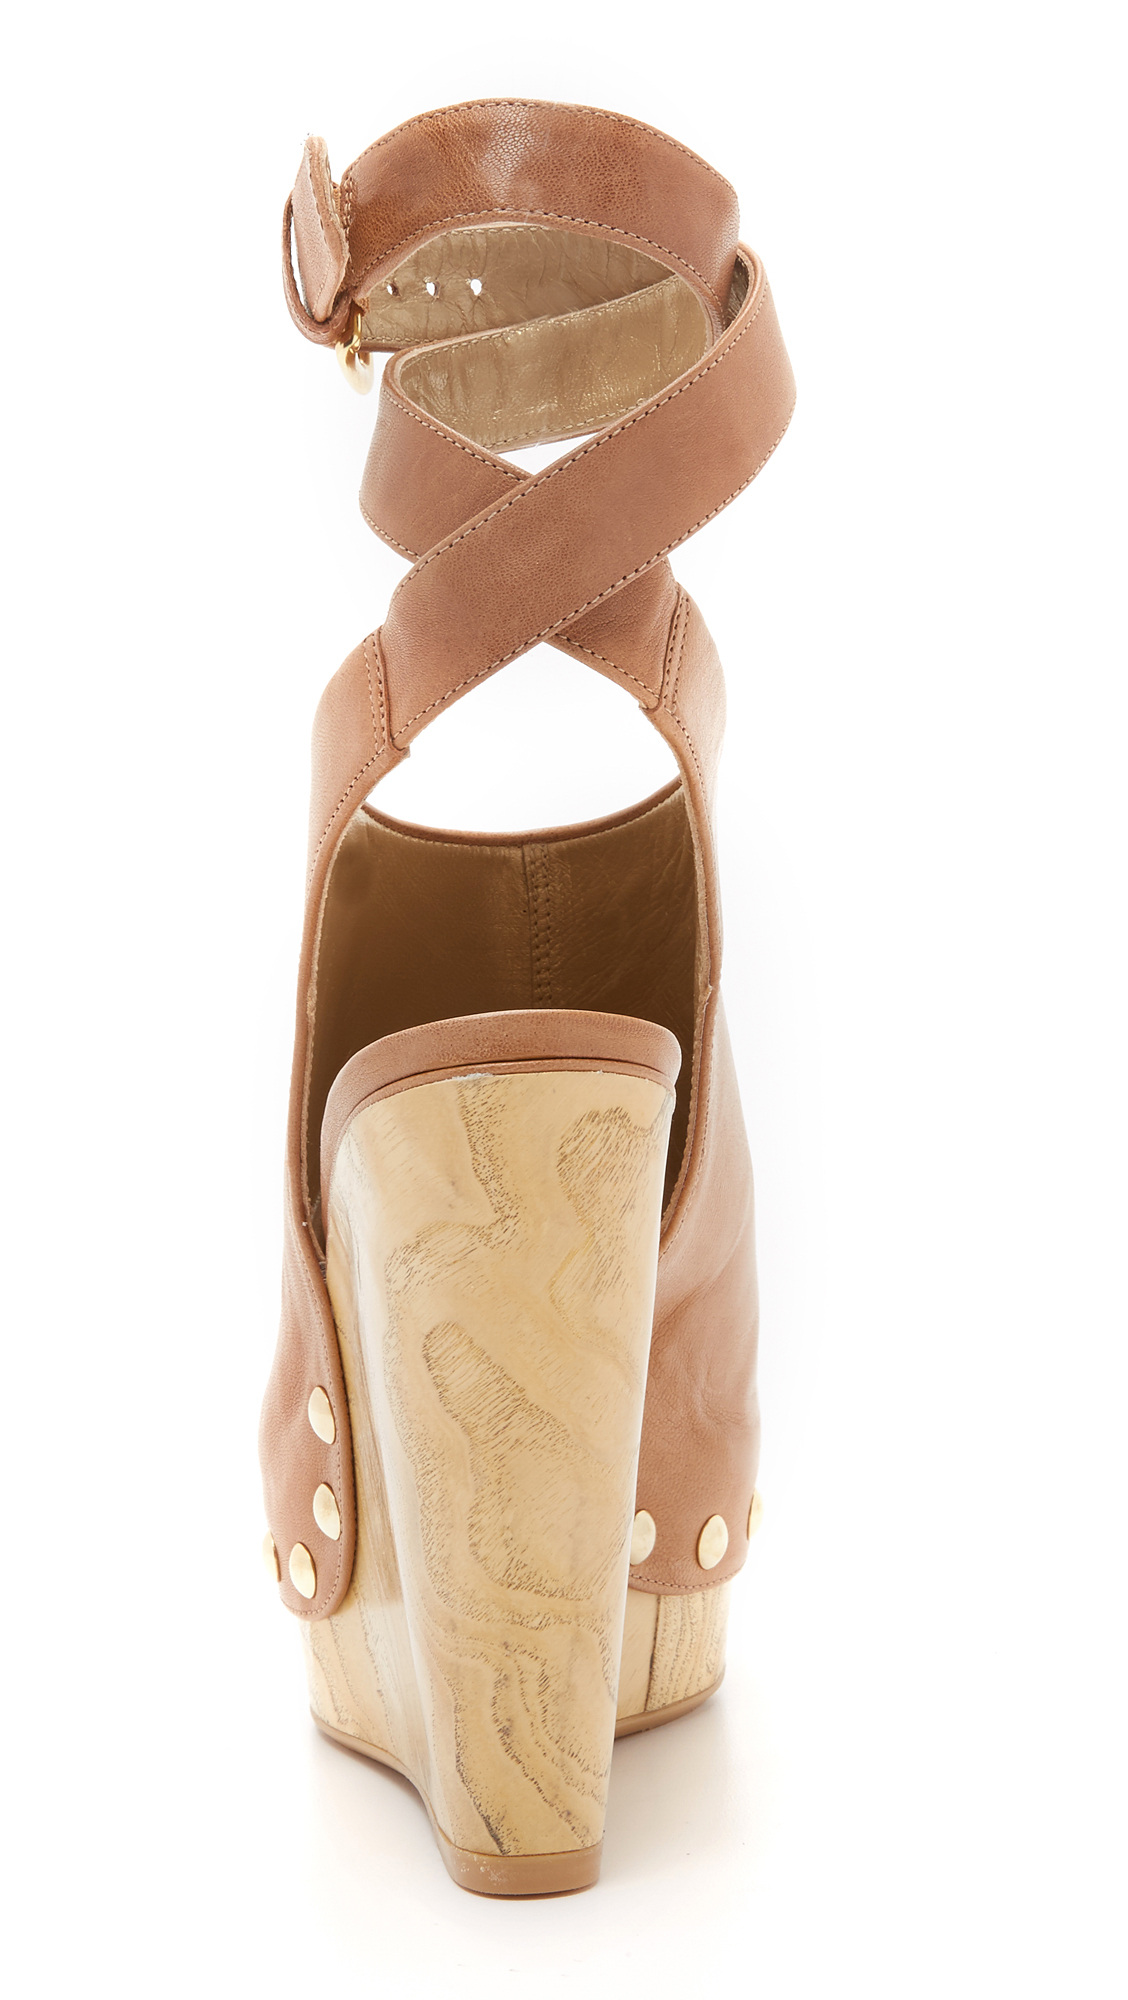 2829361a4c90 Lyst - Stuart Weitzman Wrap Up Platform Sandals in Natural